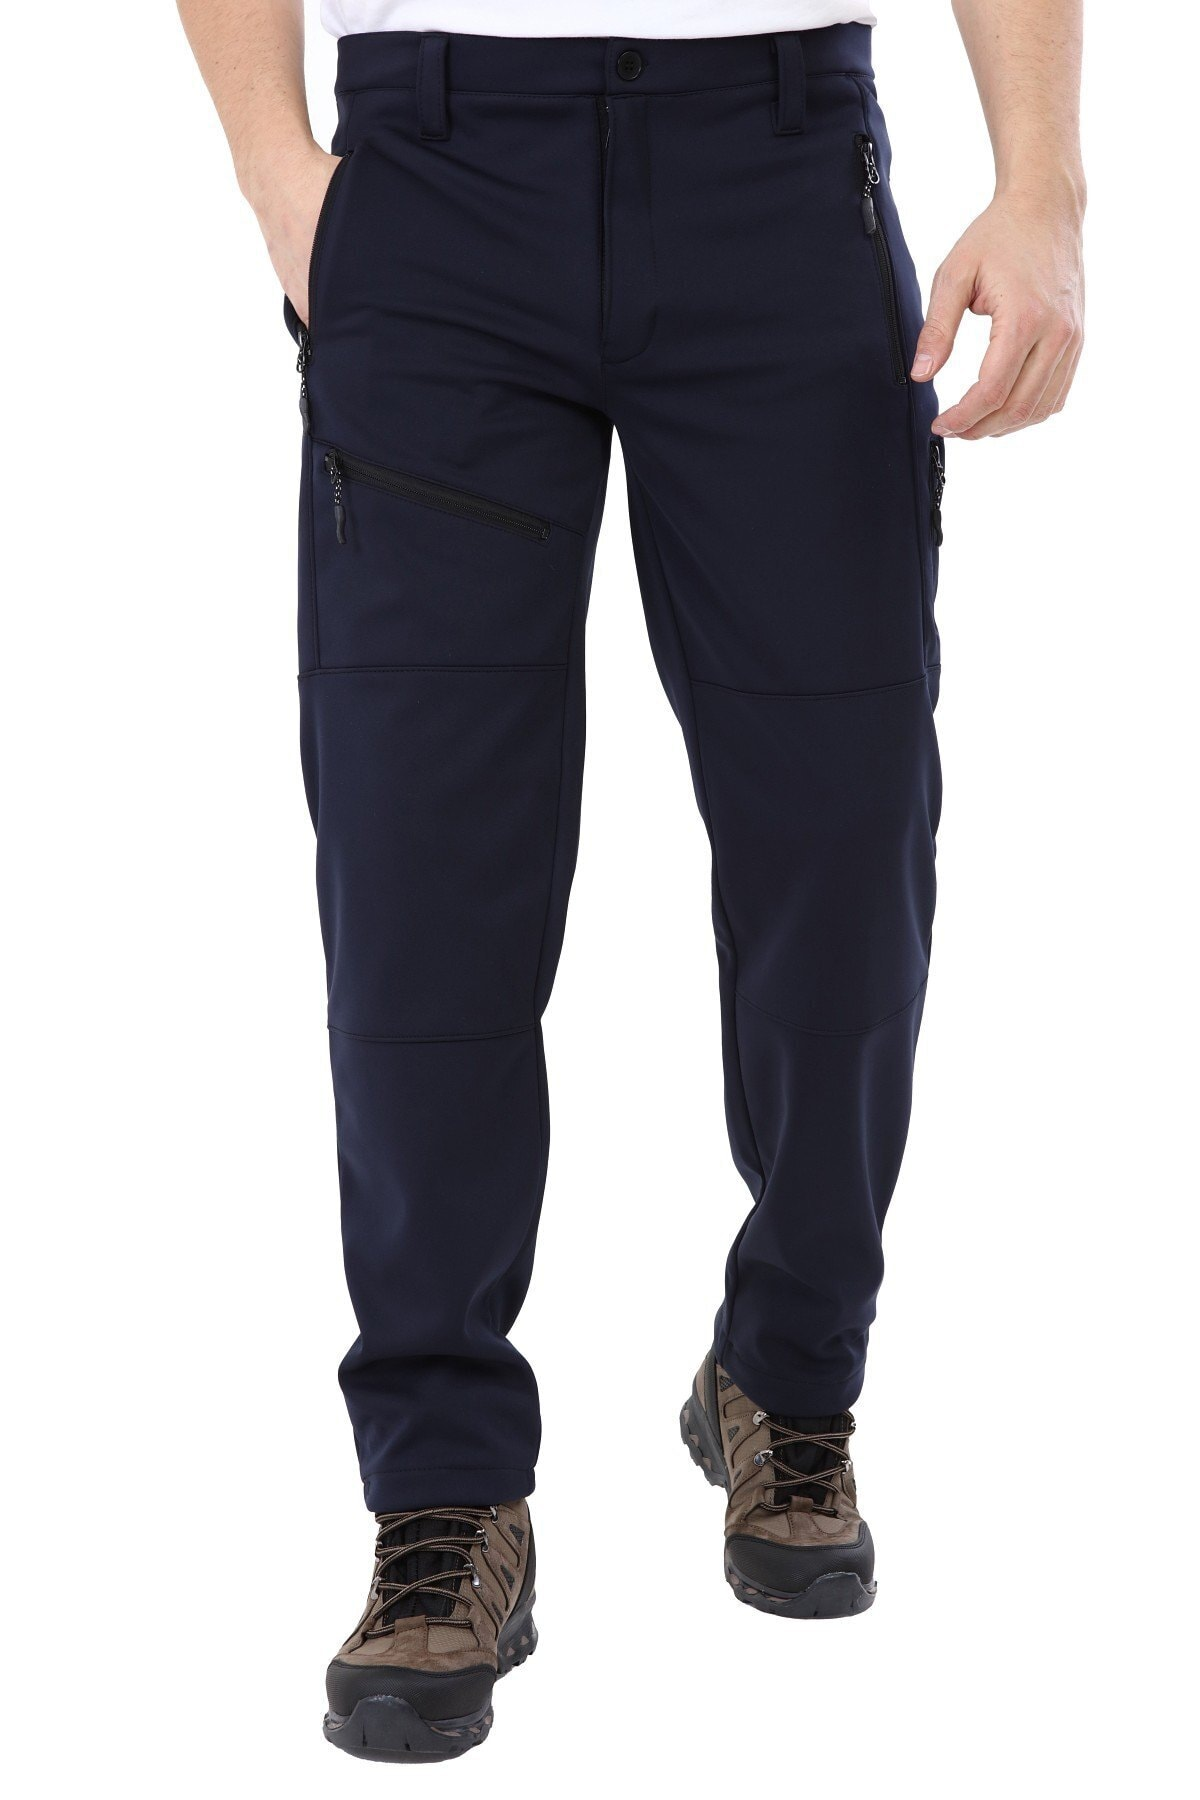 GHASSY CO. Erkek Tactical Outdoor Su Geçirmez Lacivert Softshell Pantolon 1